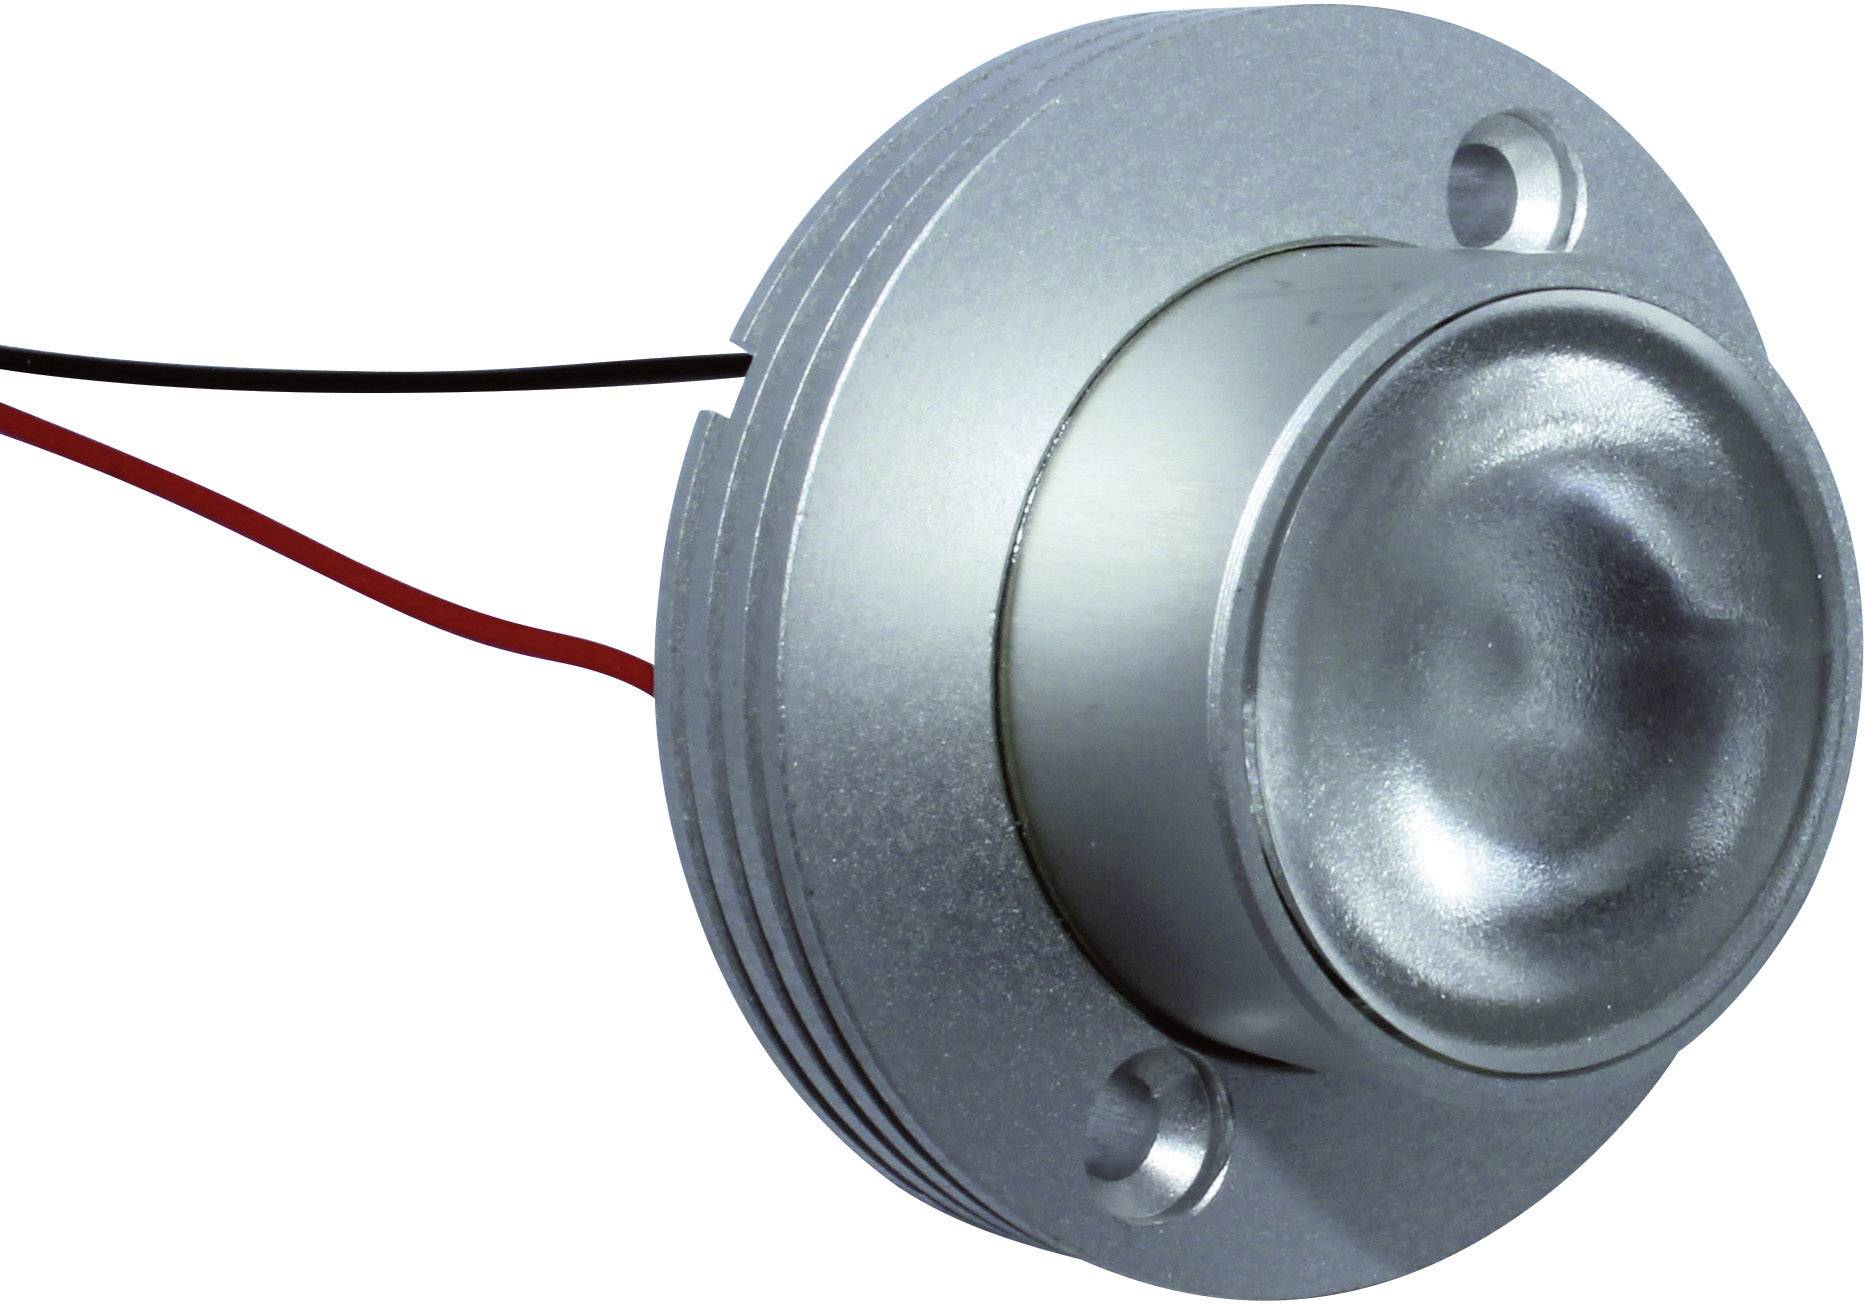 HighPower LED-spot Signal Construct QAUR1531L030, 45 °, 80 lm, 1 W, 3.3 V, jantárová